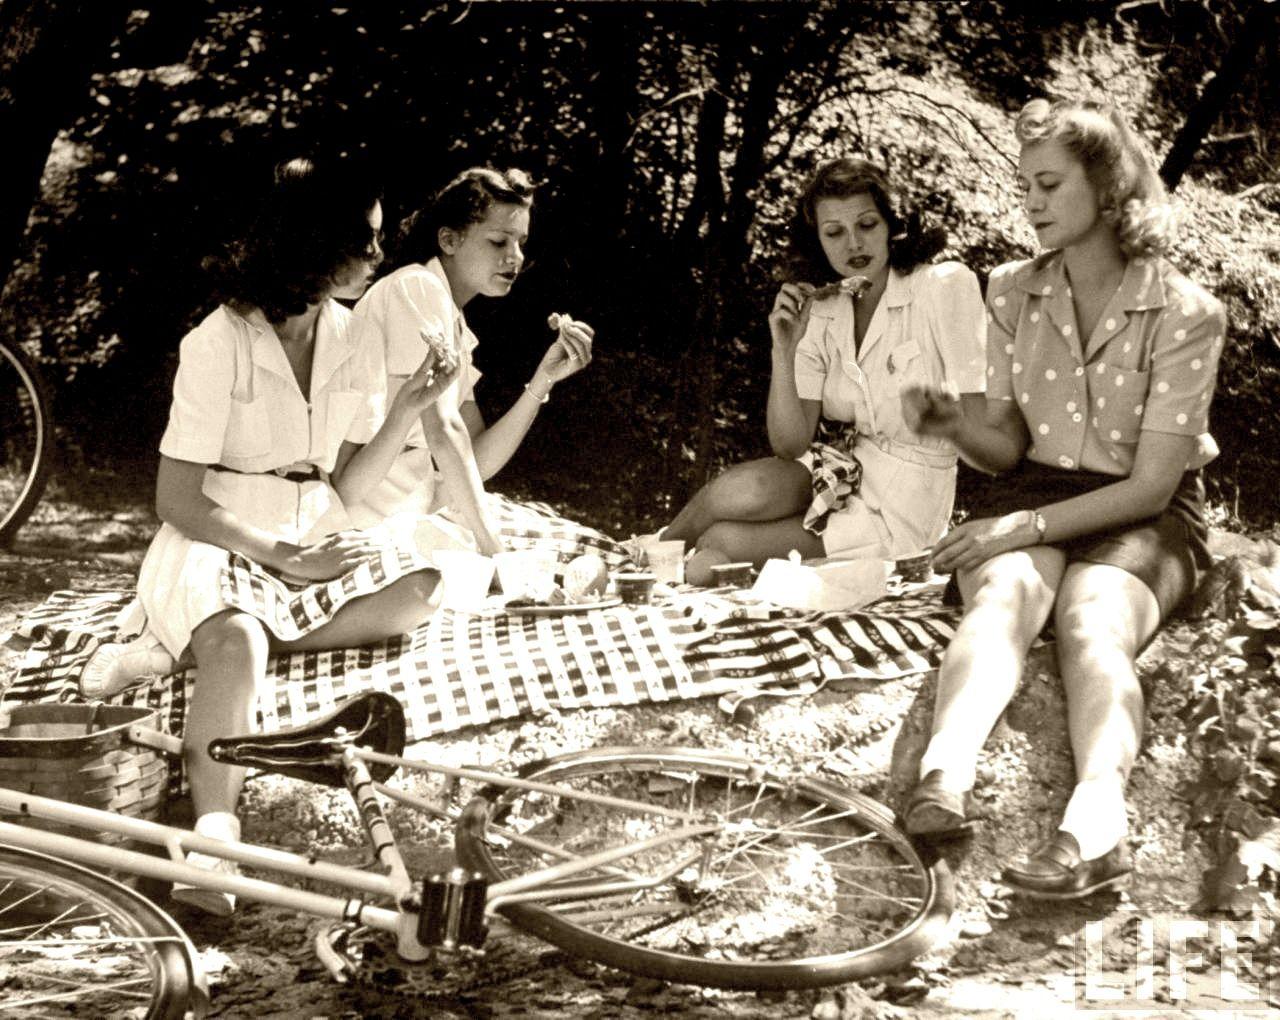 Retro picnic | Rita hayworth, Vintage picnic, Picnic in the park